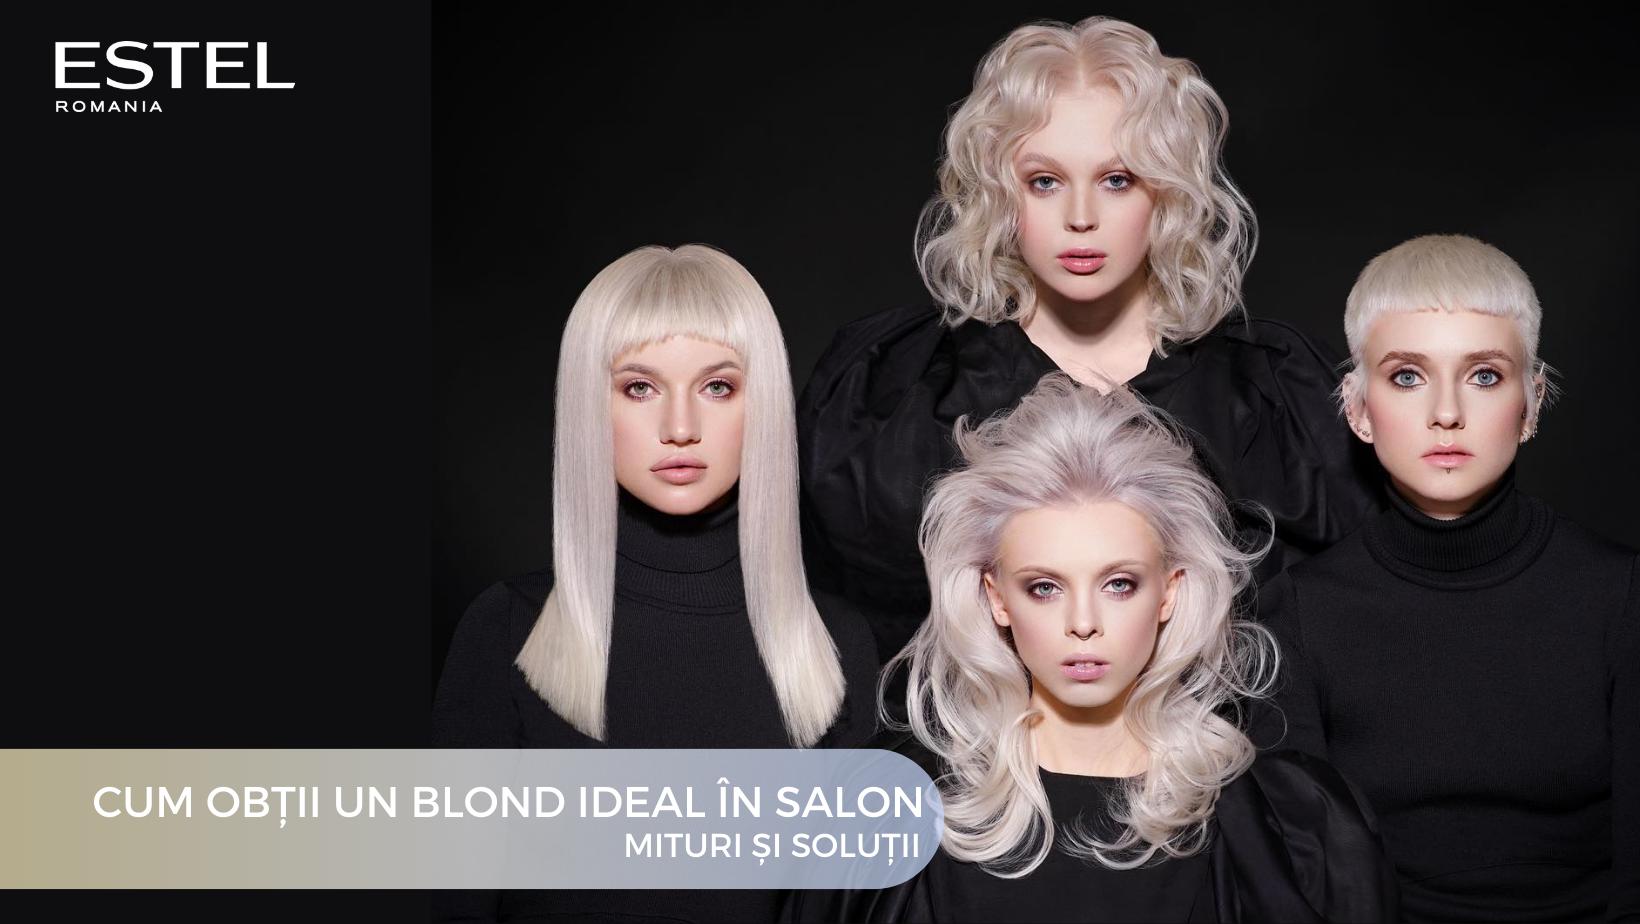 Cum obtii un blond ideal in salon. Mituri si solutii